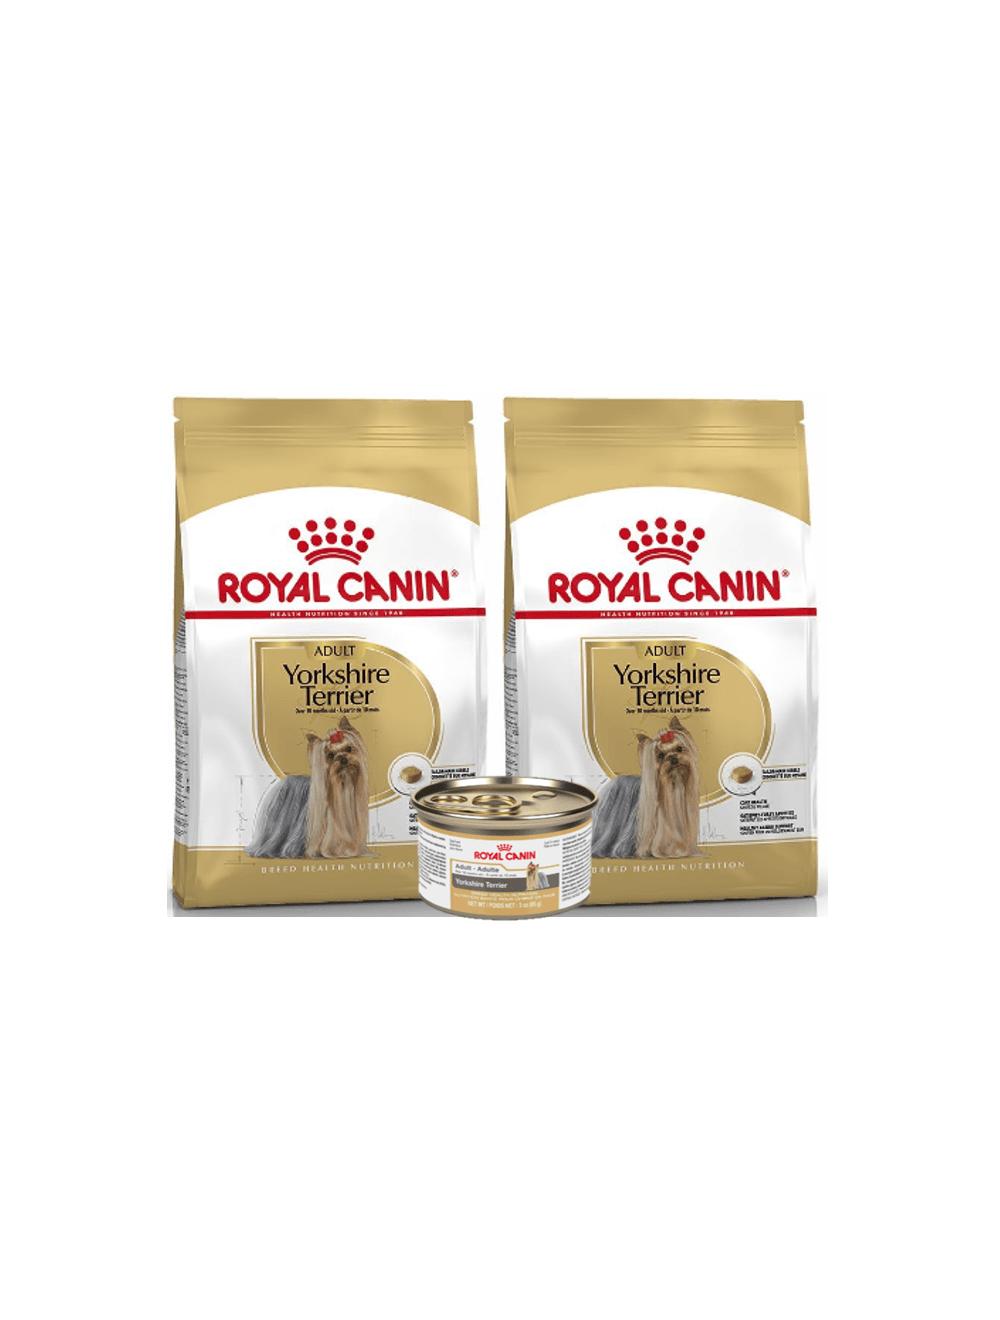 Royal Canin Yorkshire Adulto 1.13 kg Combo x 2 + Lata gratis